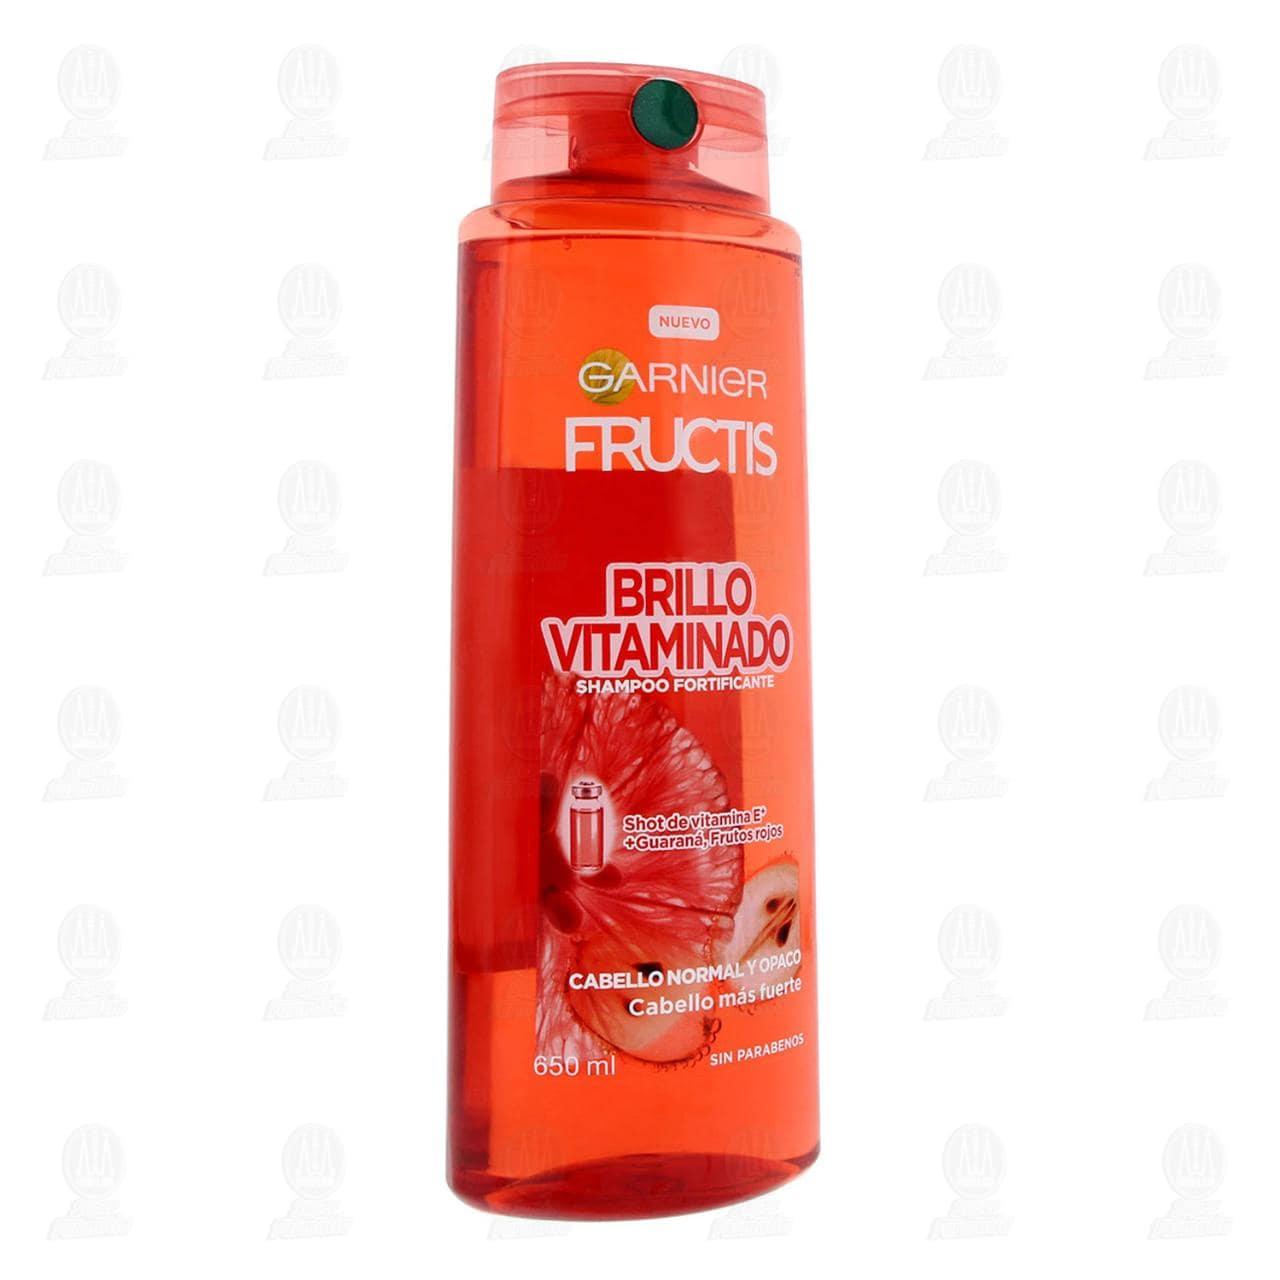 Comprar Shampoo Garnier Fructis Brillo Vitaminado con Shot de Vitamina E + Guaraná, 650 ml. en Farmacias Guadalajara